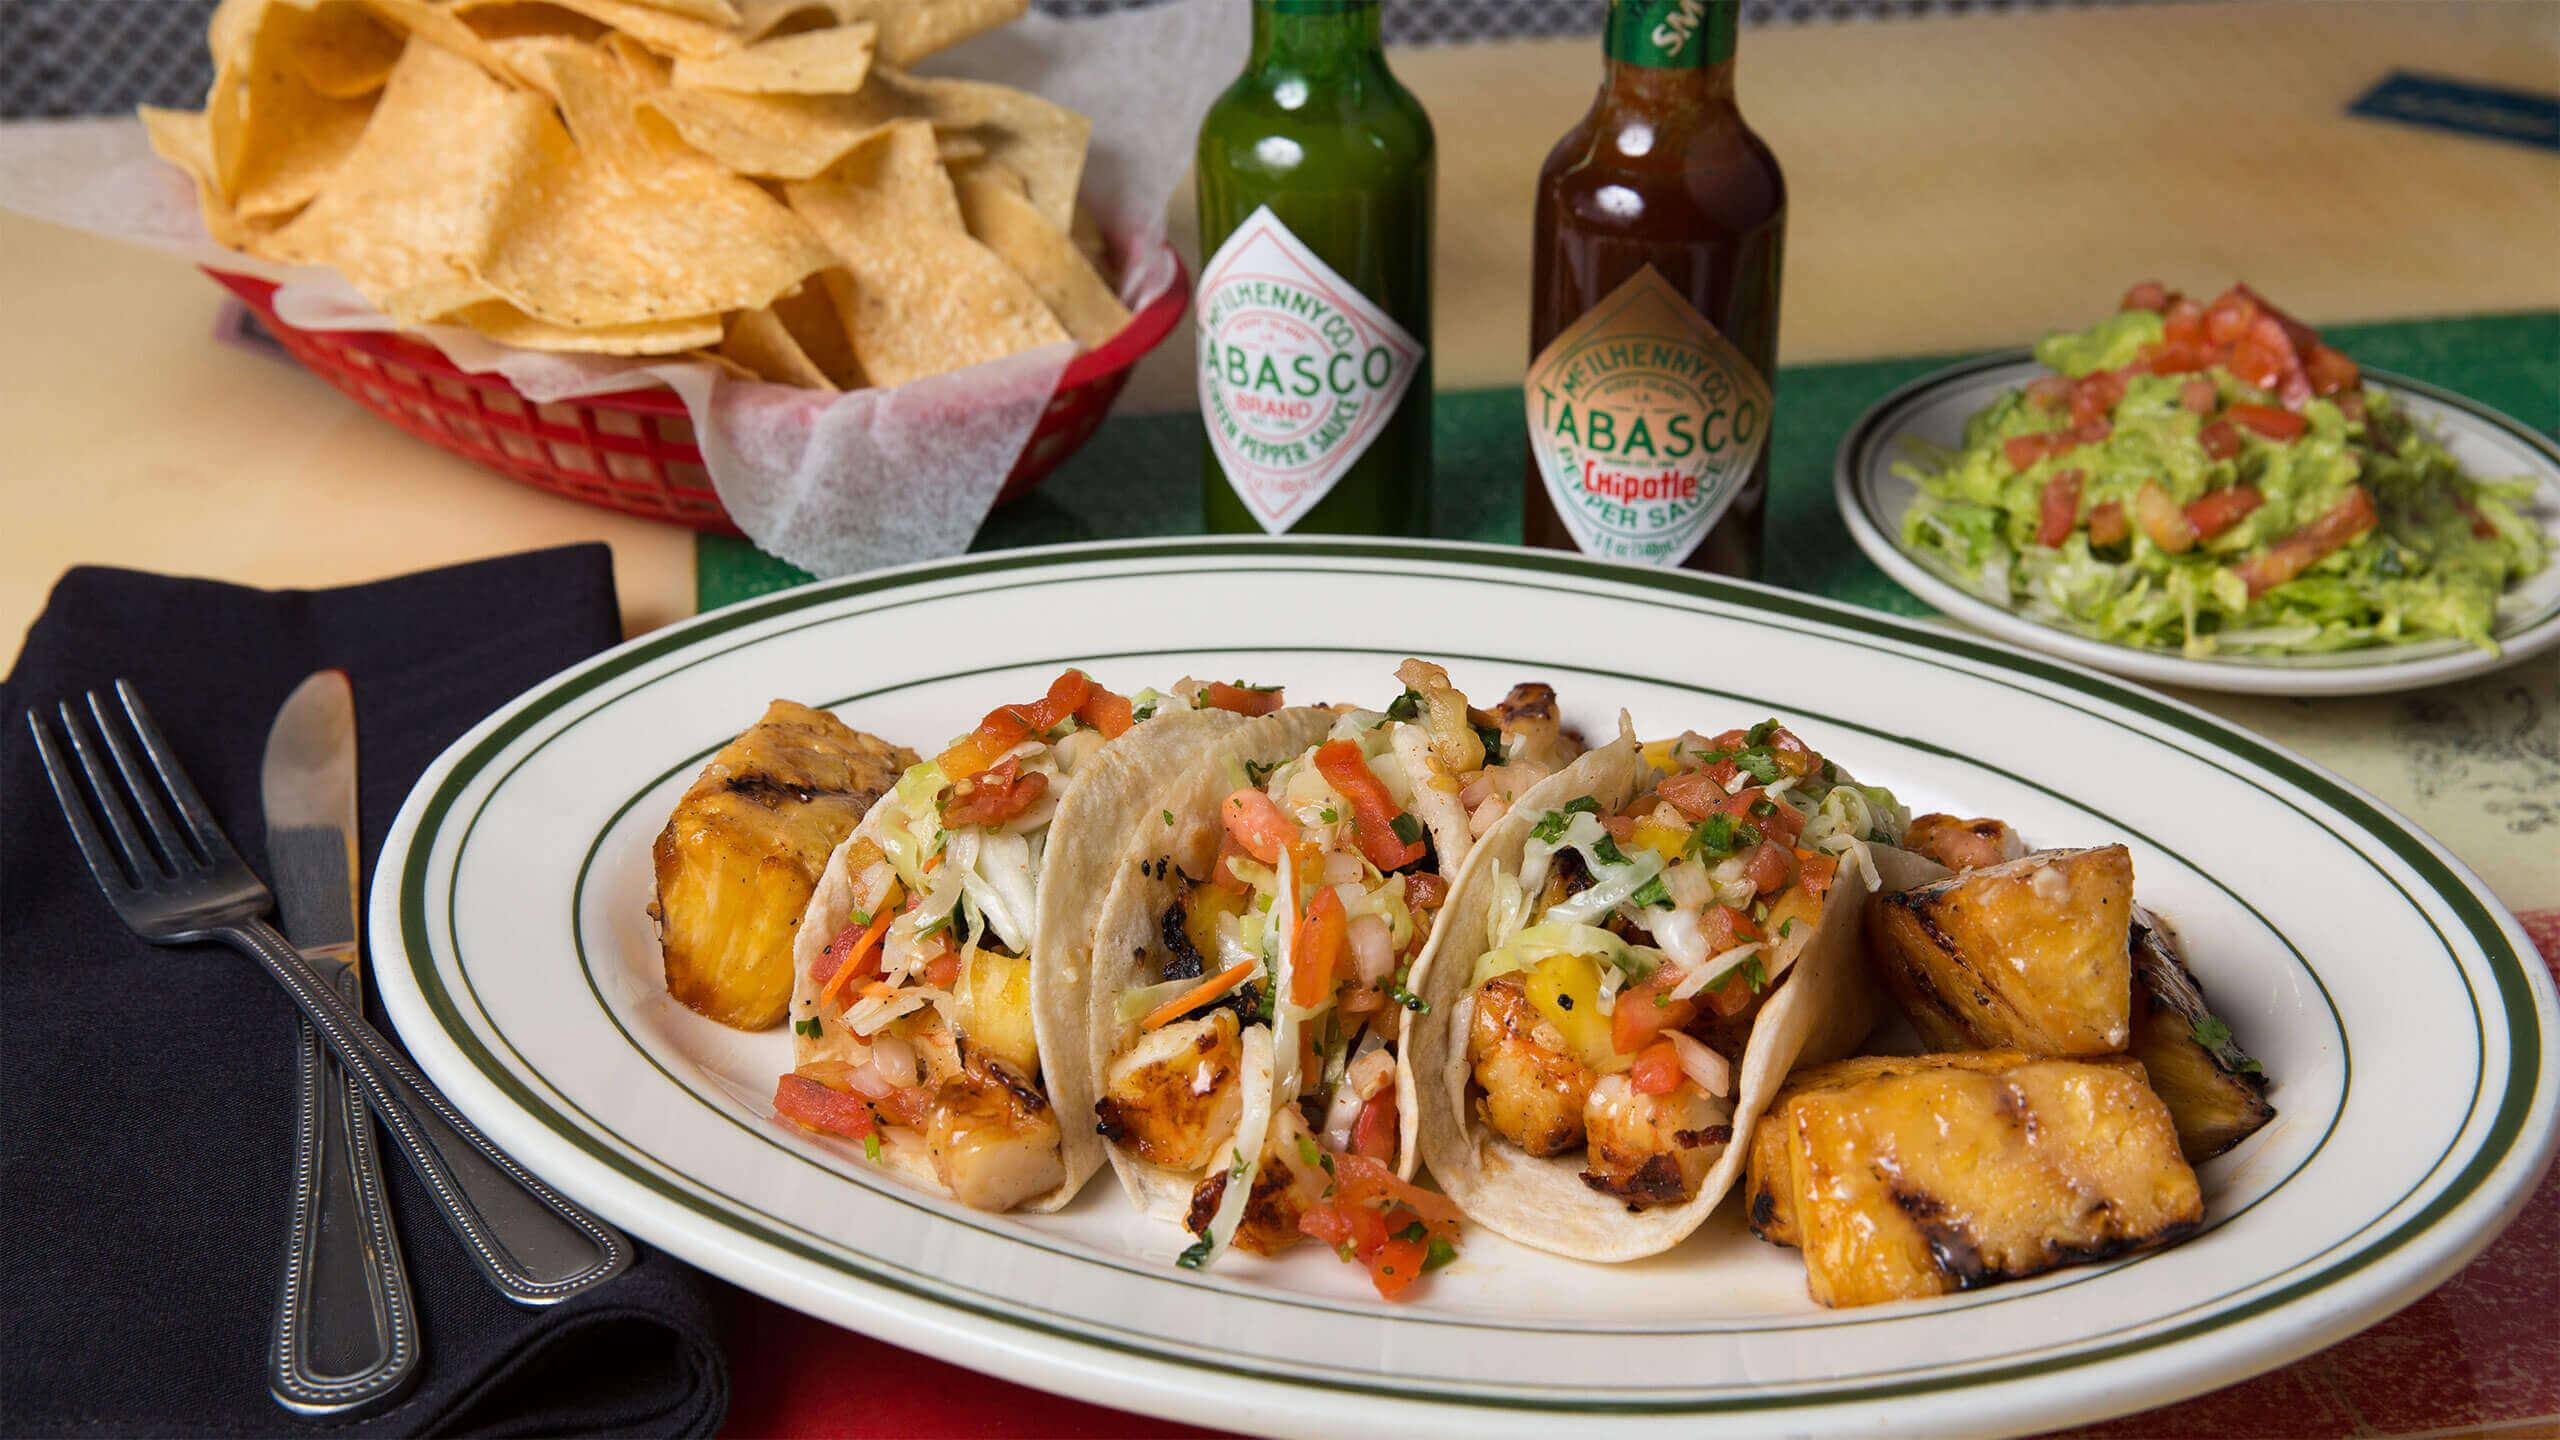 Grilled Shrimp Tacos with Jalapeño Pineapple Slaw